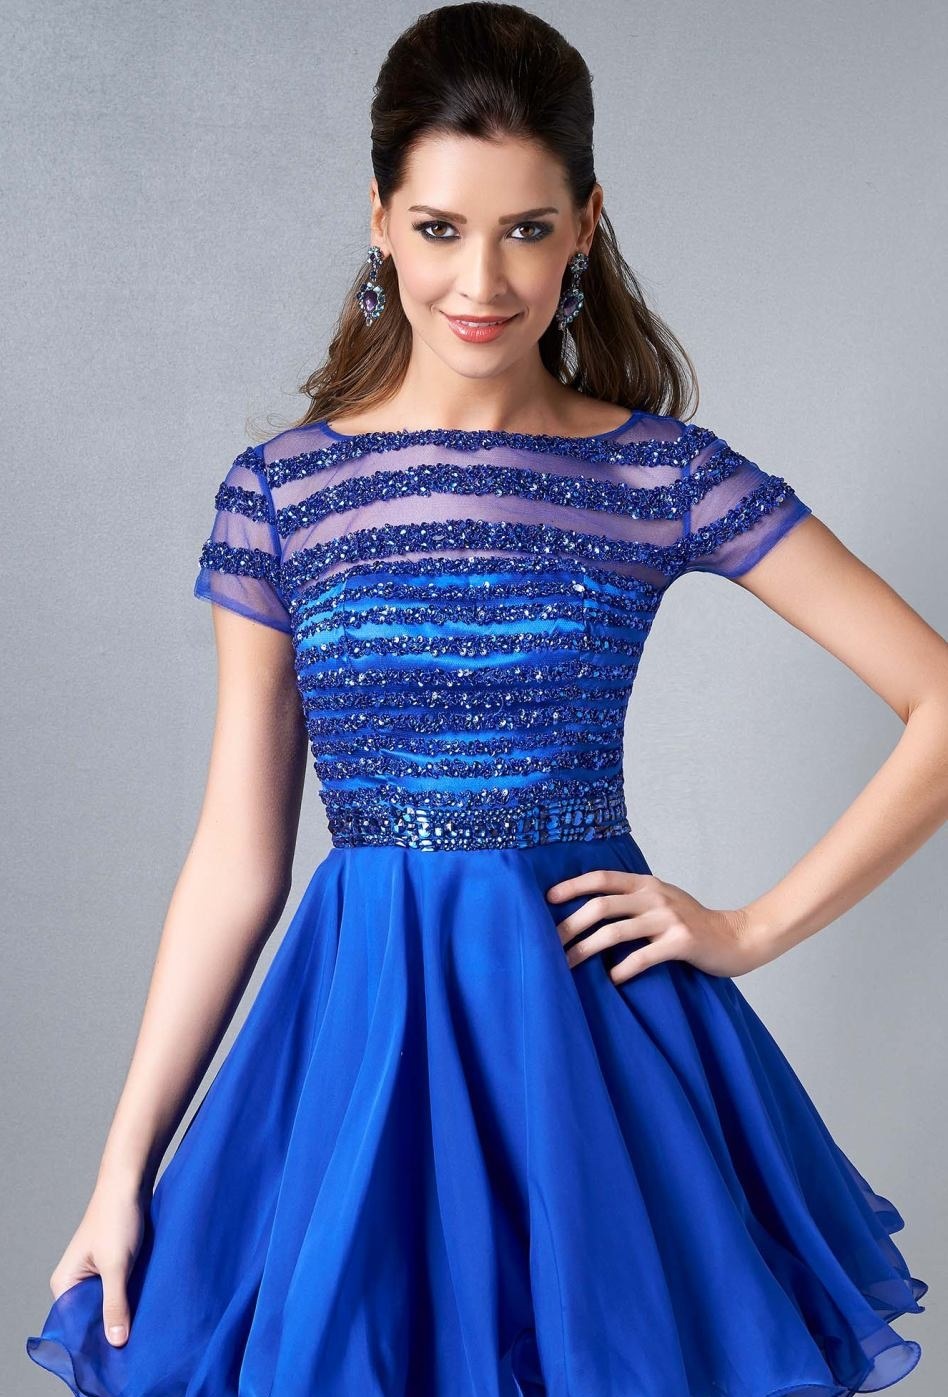 Stylish-Cocktail-Dresses-New- Designs (24)